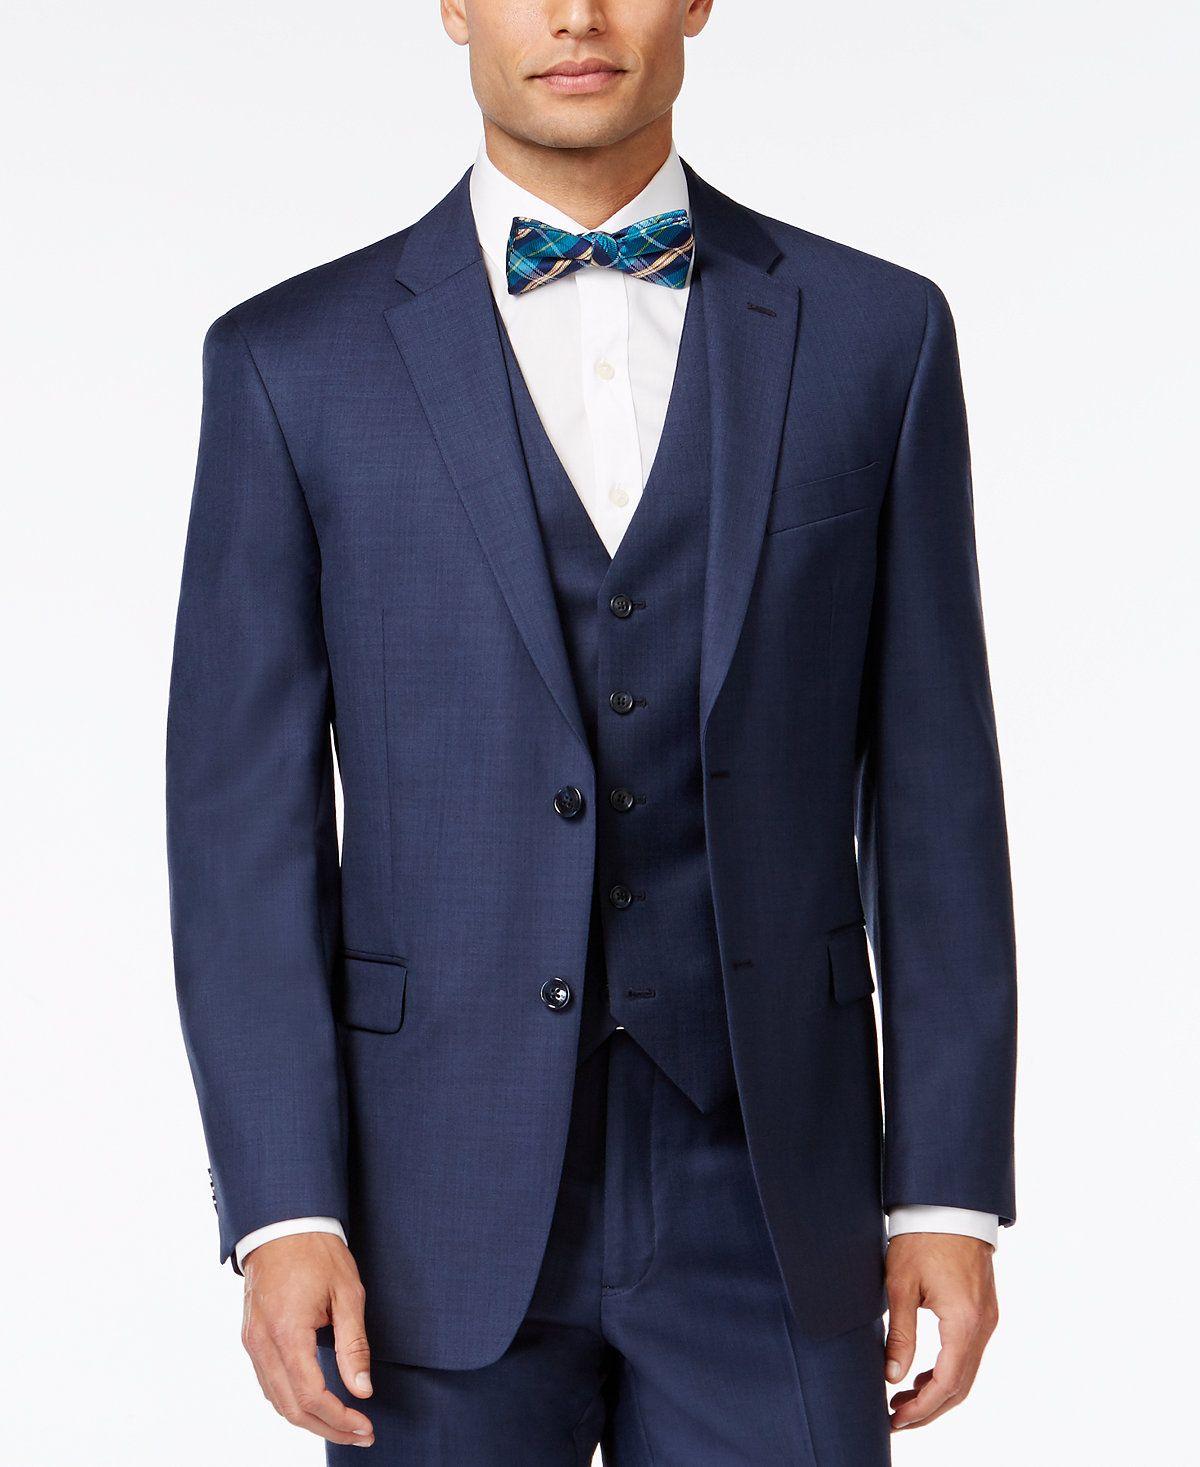 Tommy Hilfiger Blue Sharkskin ClassicFit Jacket Suits